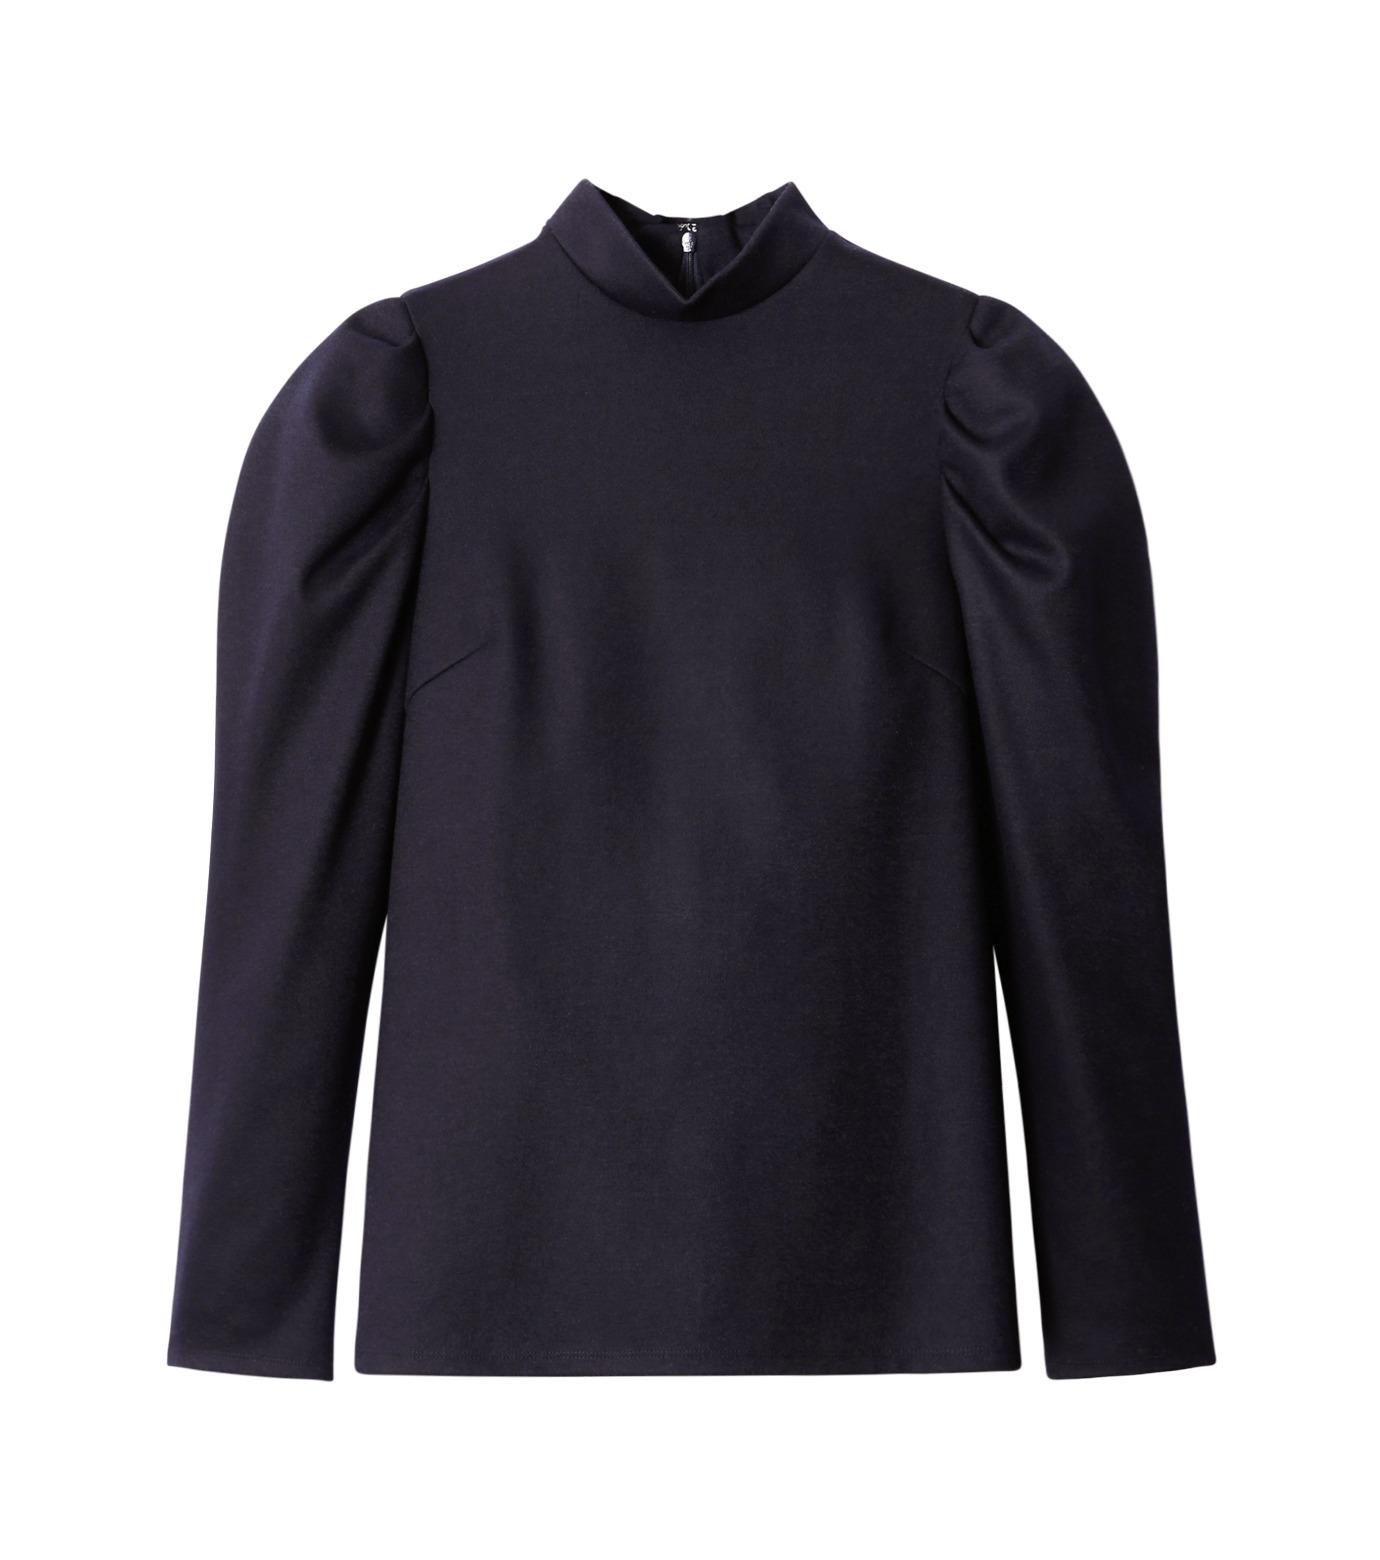 LE CIEL BLEU(ルシェルブルー)のパフカットトップス-NAVY(カットソー/cut and sewn)-18A62514 拡大詳細画像4